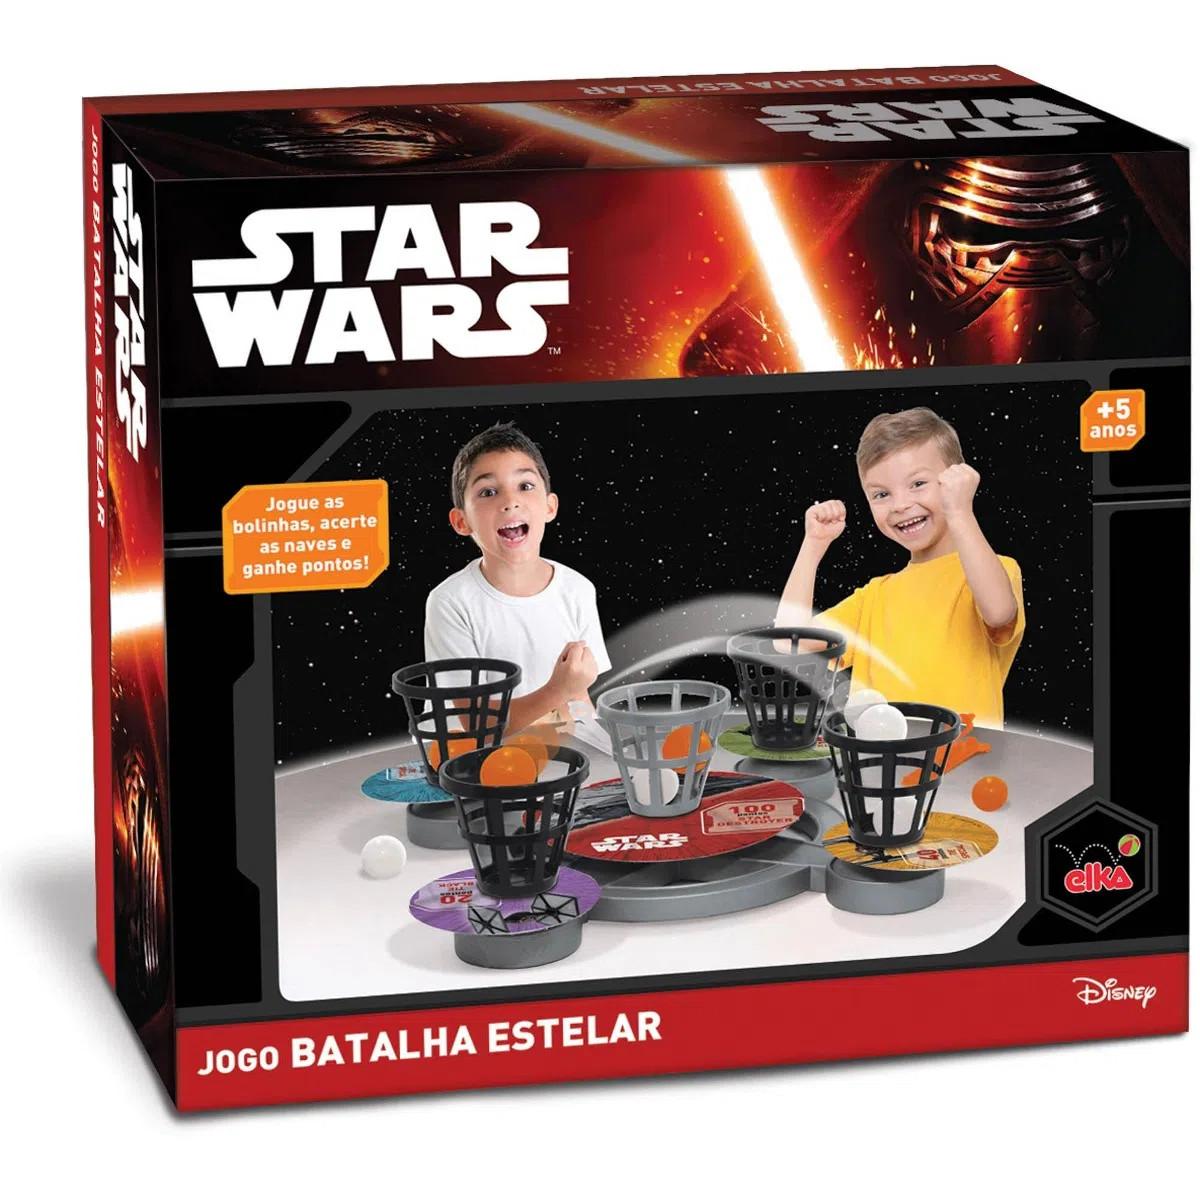 Jogo Batalha Estelar - Star Wars